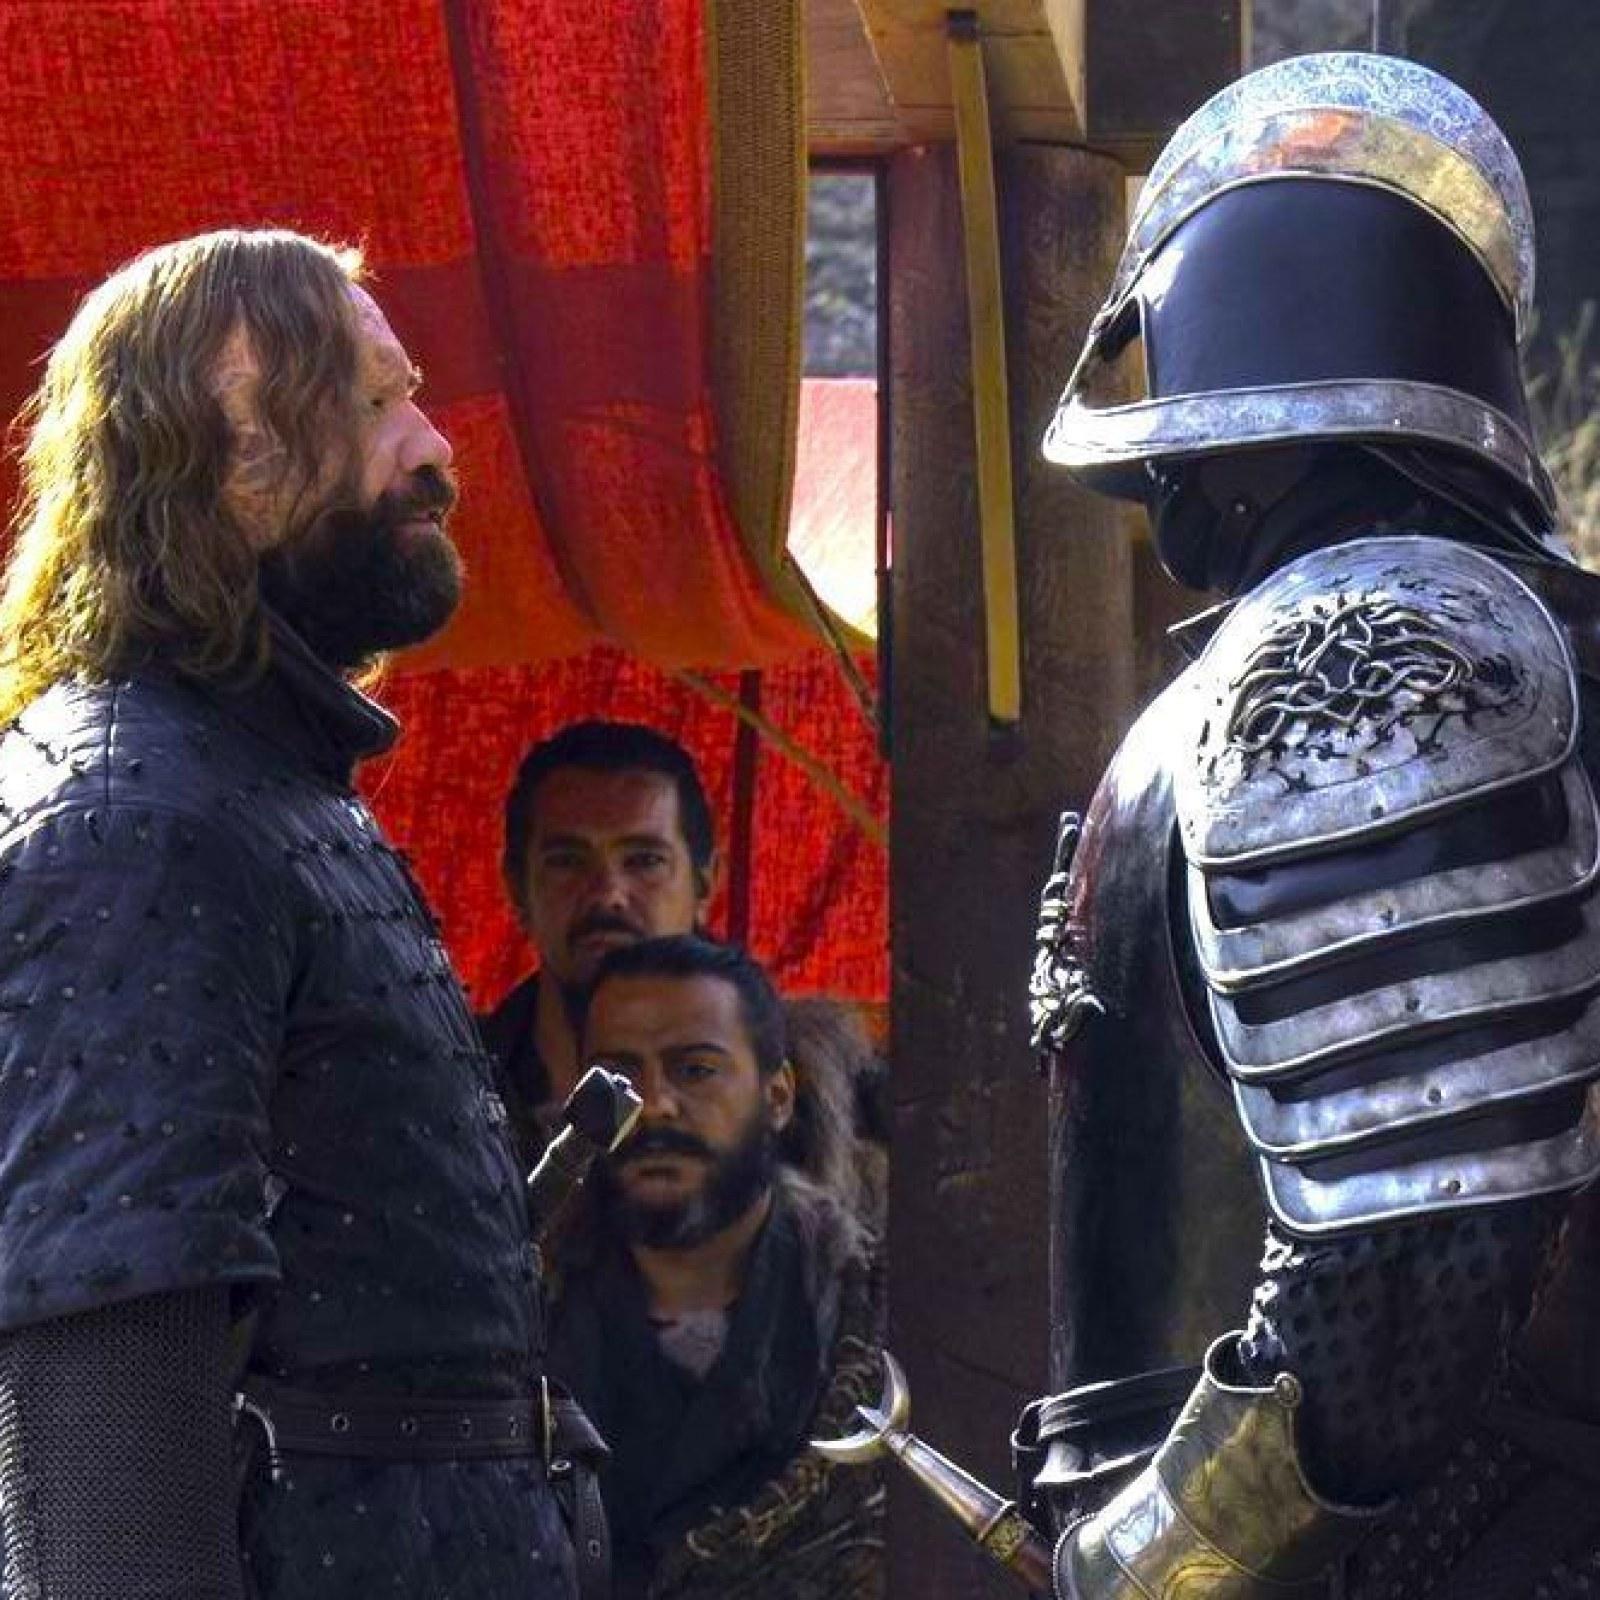 Game of Thrones' Season 8, Episode 5 Leaks Include Major